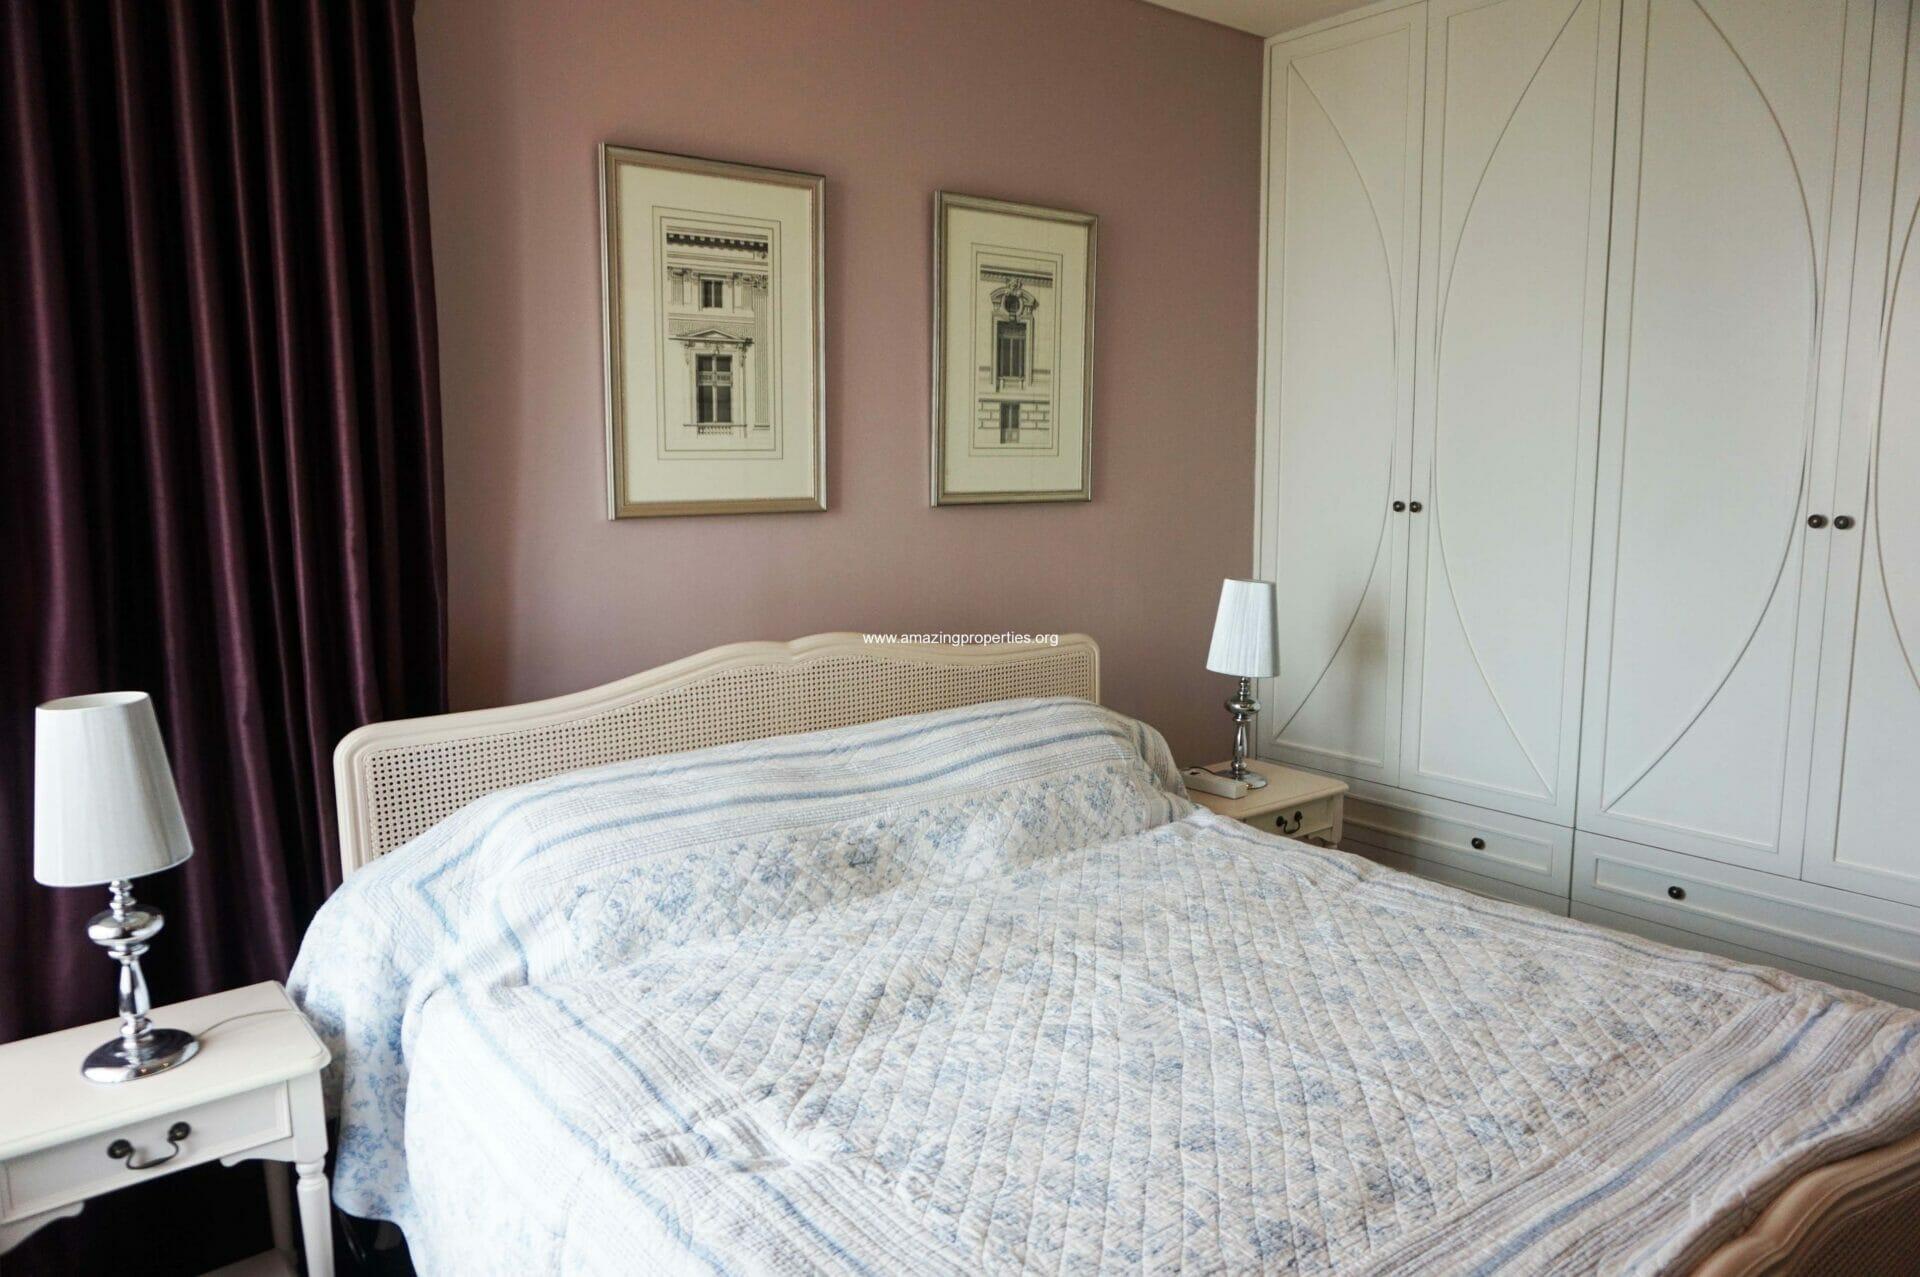 2 Bedroom Condo Aguston Sukhumvit 22-6